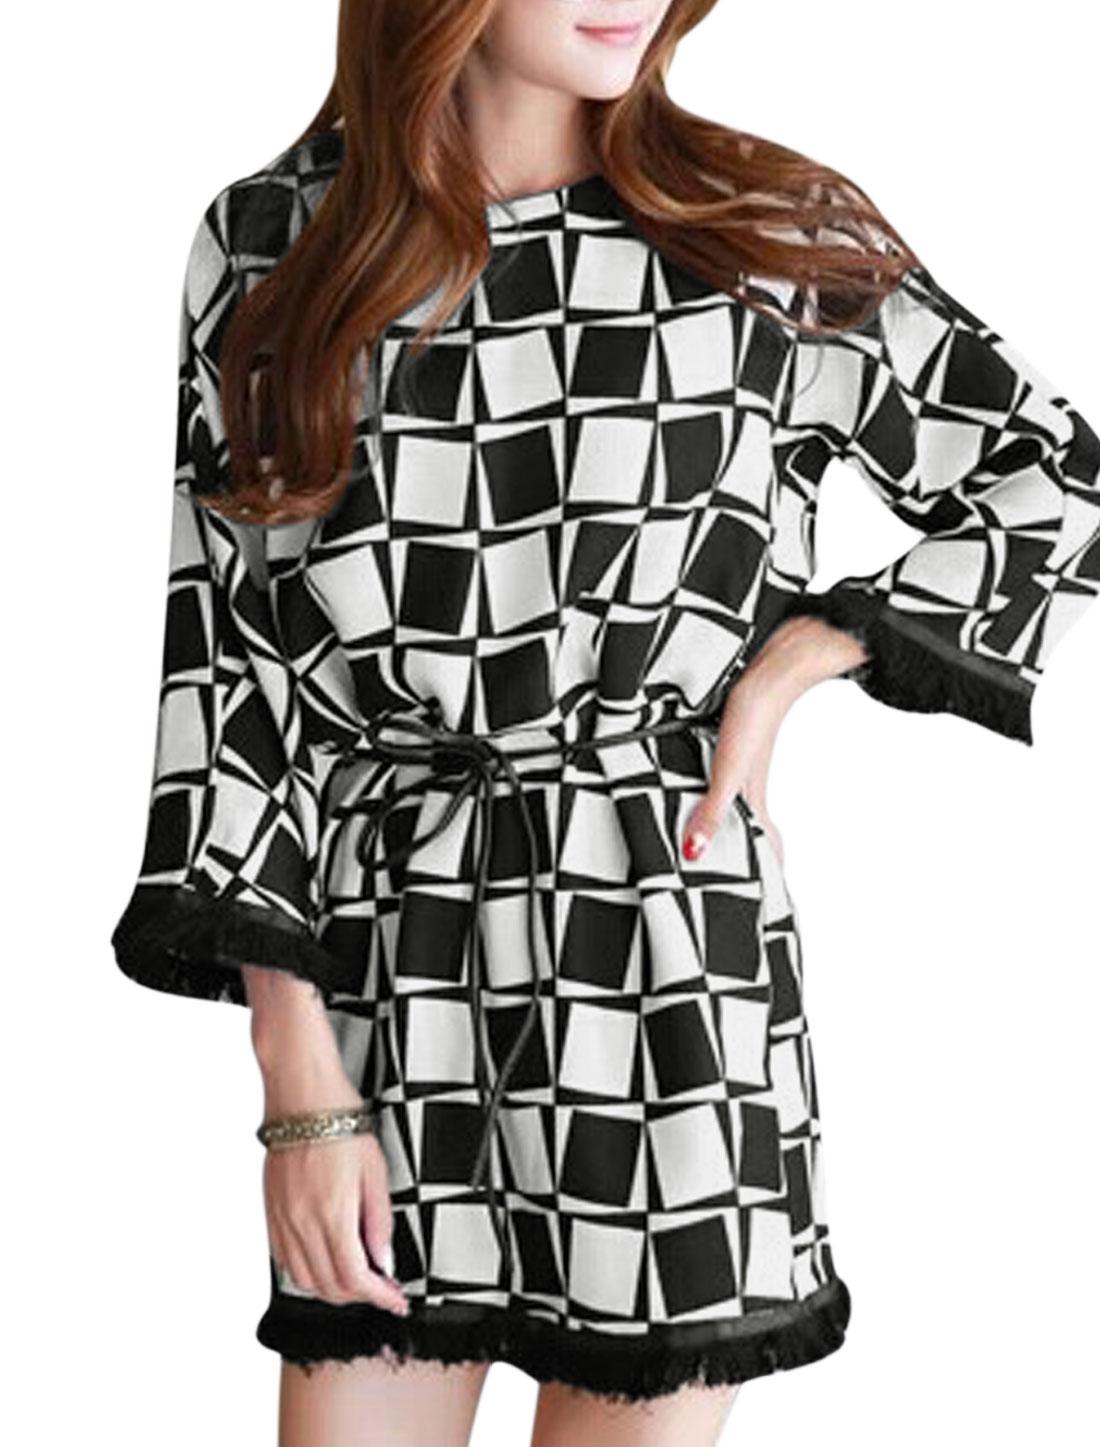 Women Plaids Round Neck 3/4 Sleeve Straight Dress w Waist String Black White S